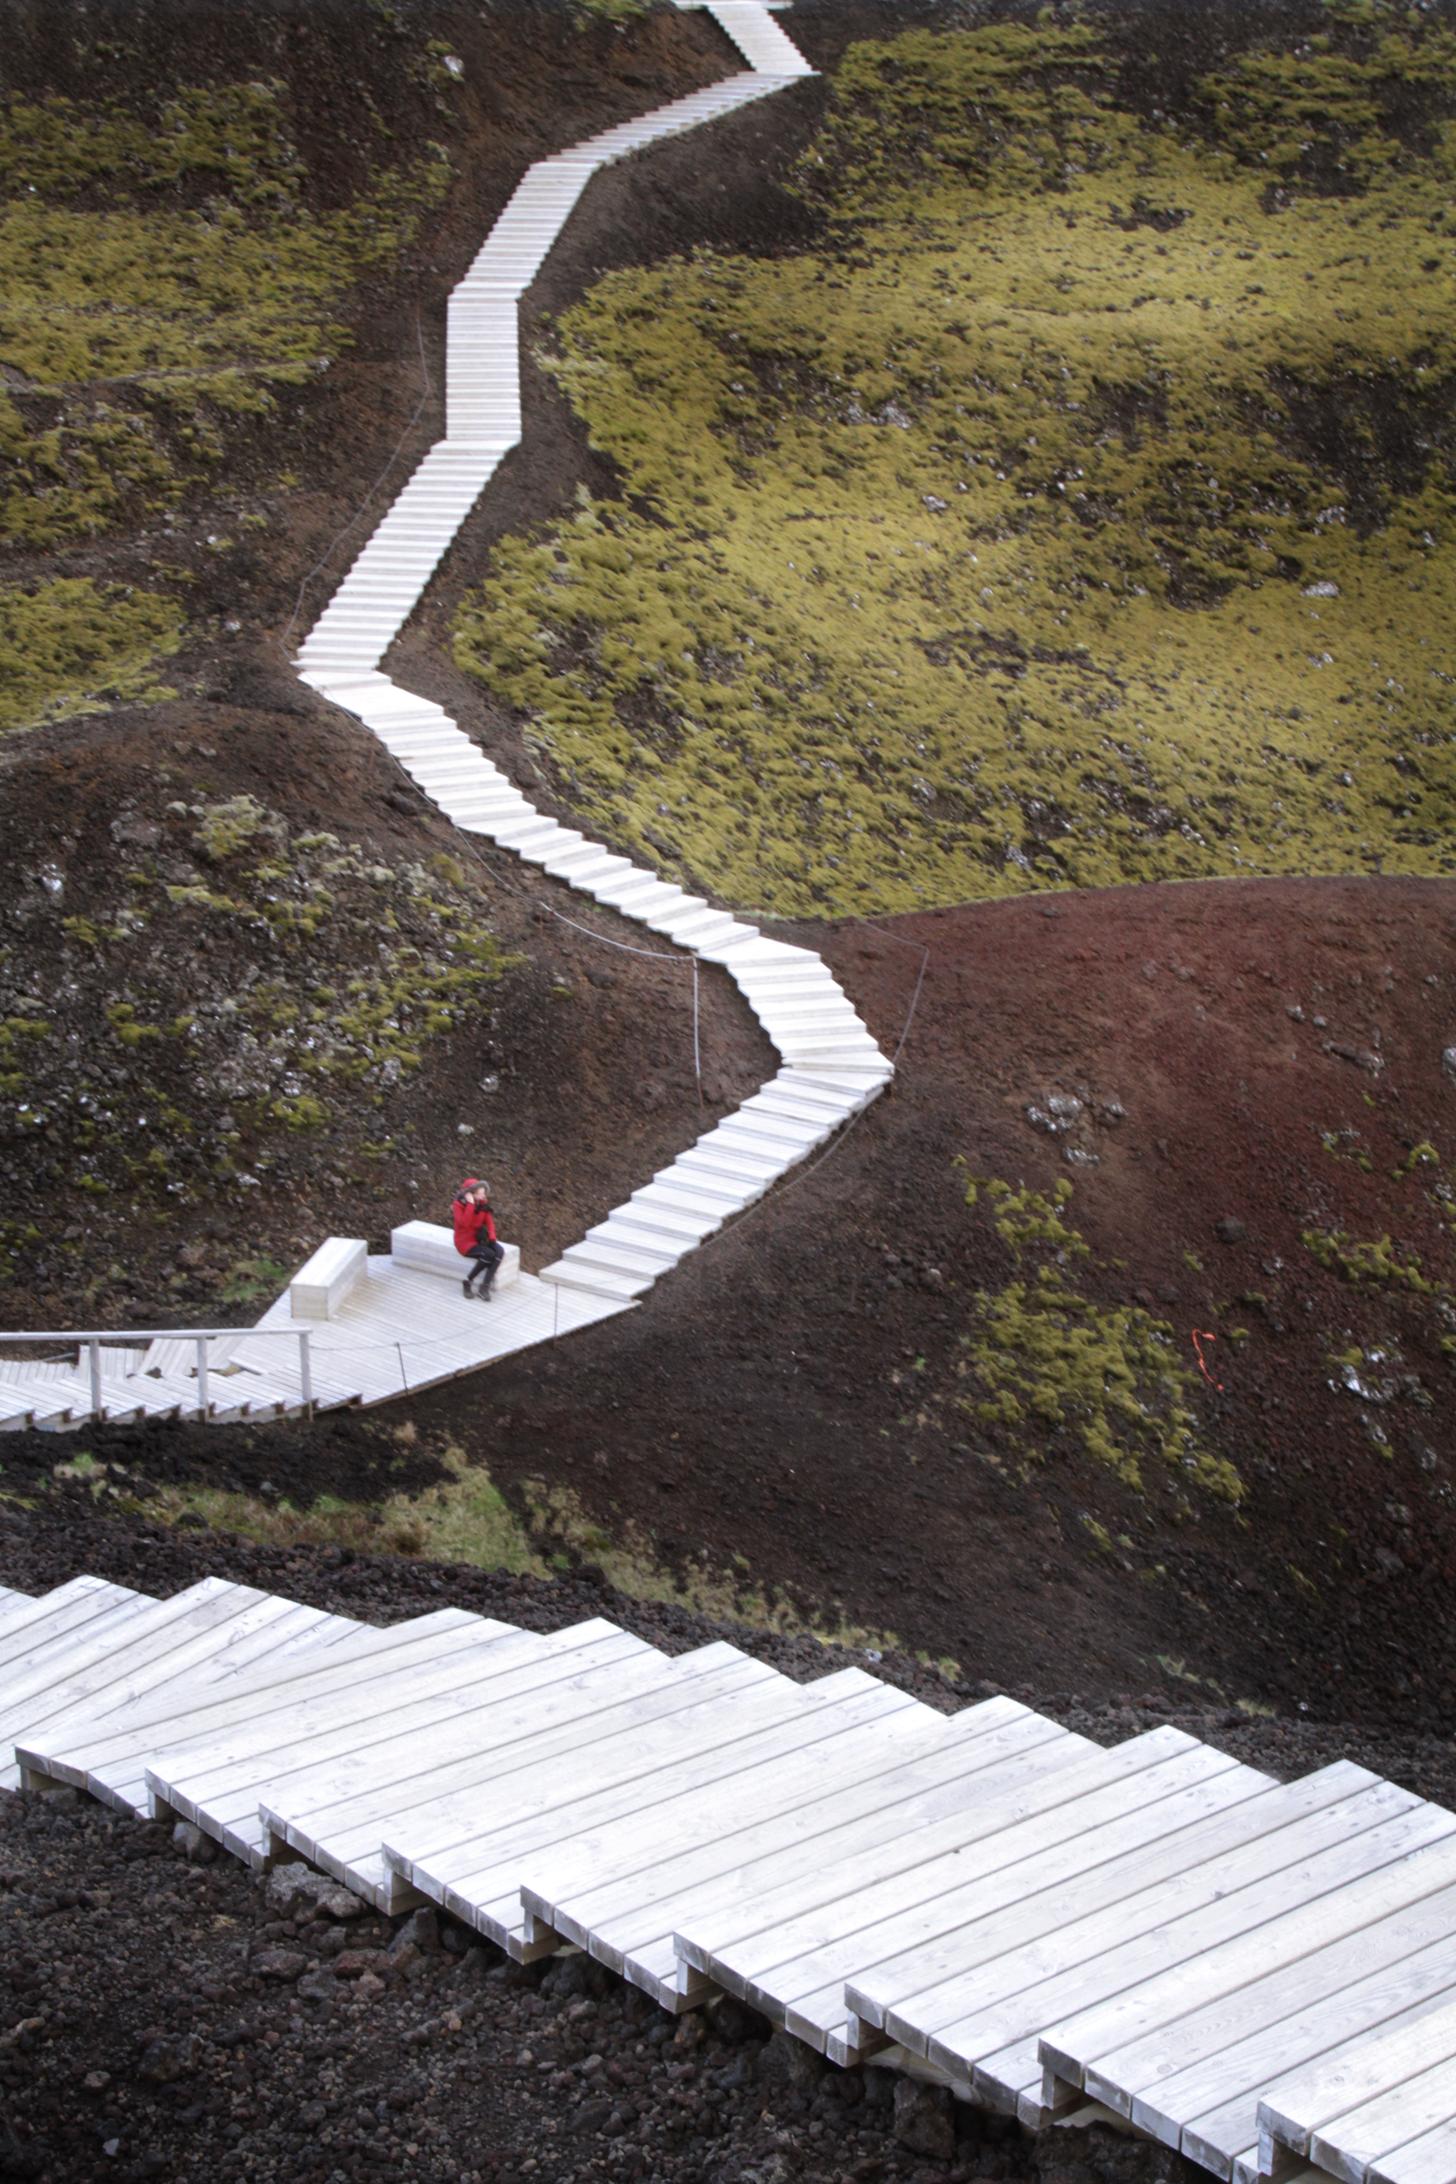 grabrok volcano, iceland